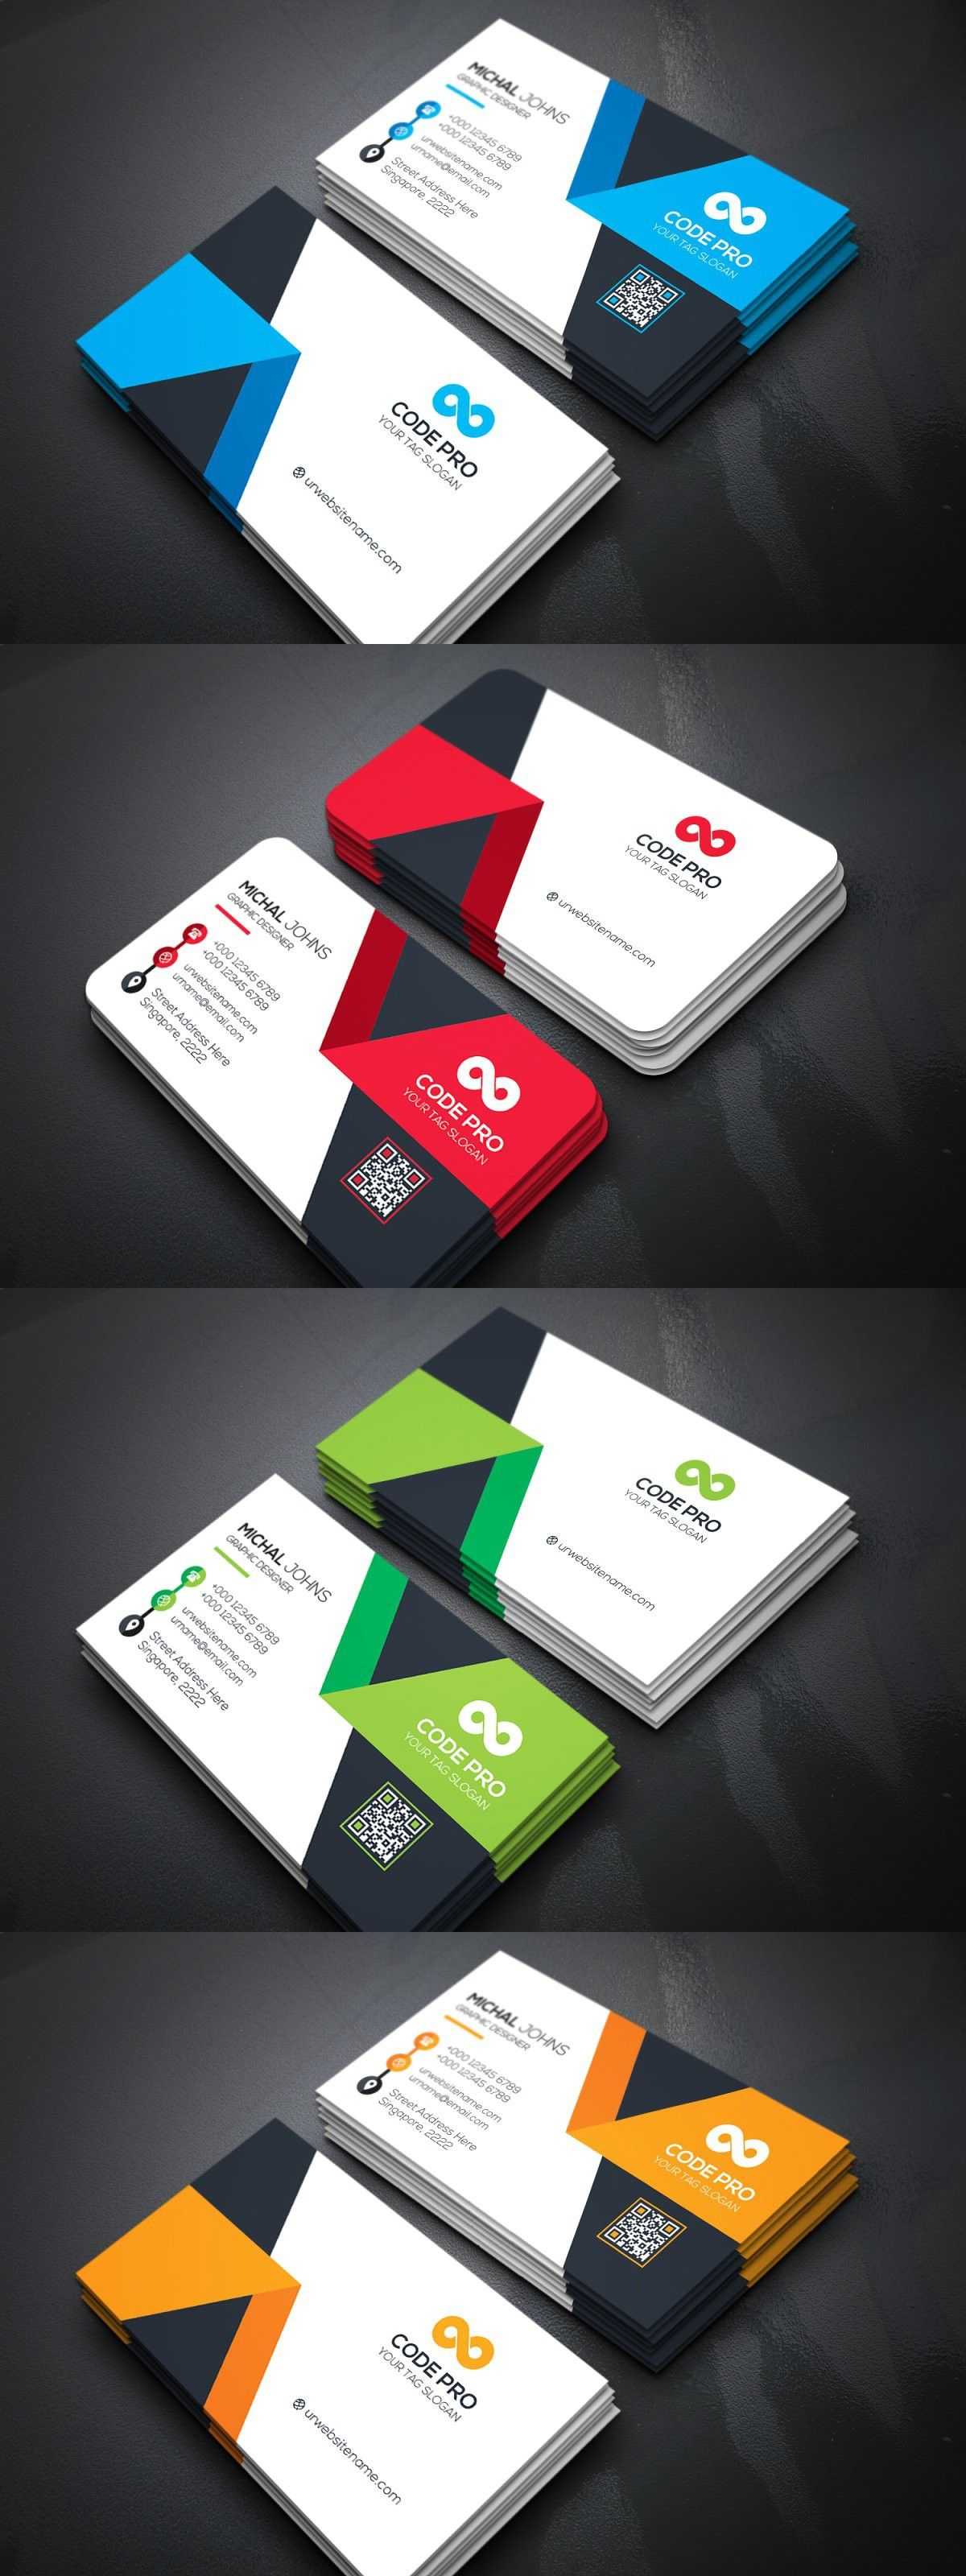 Business Cards Business Cards Cards Business Card Template